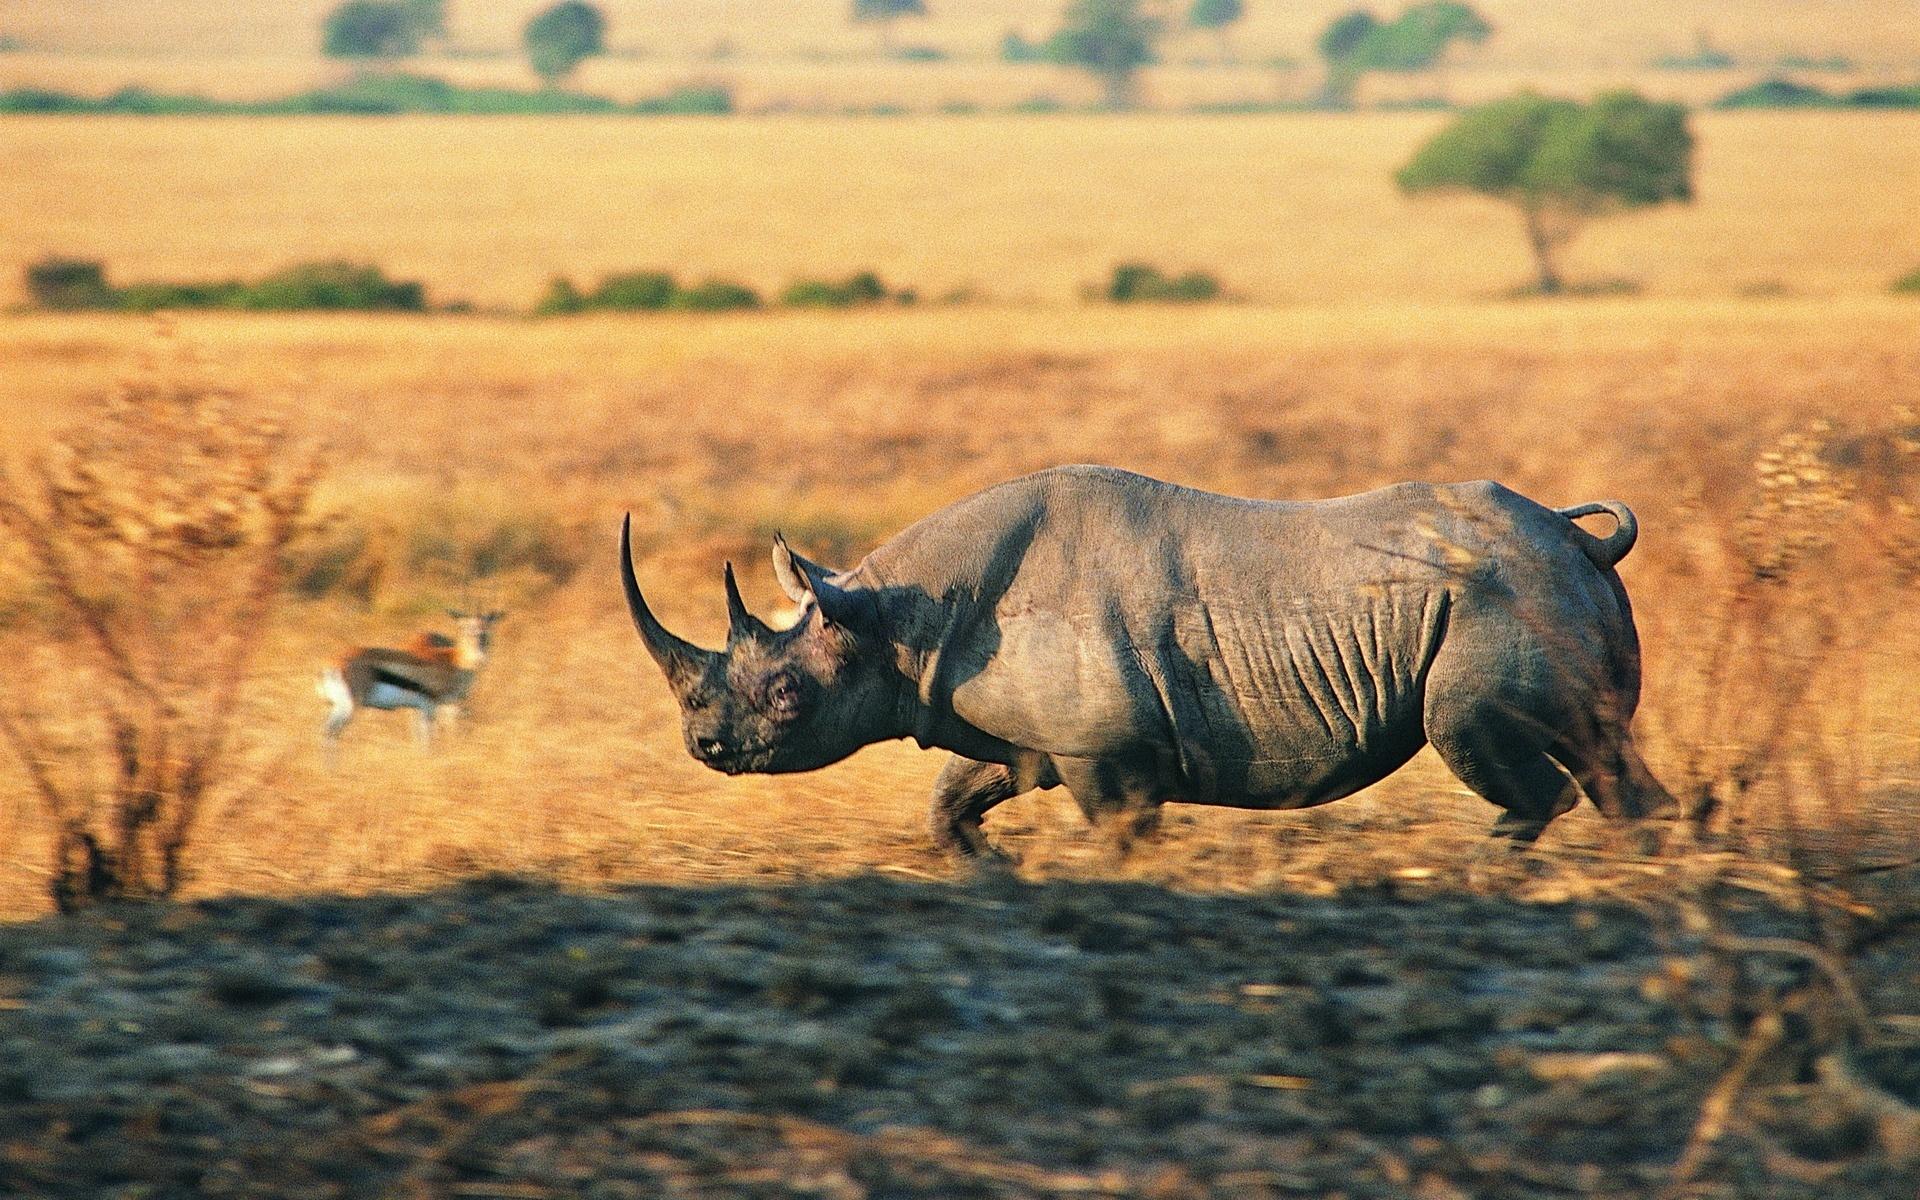 Charging Rhino HD Wallpaper